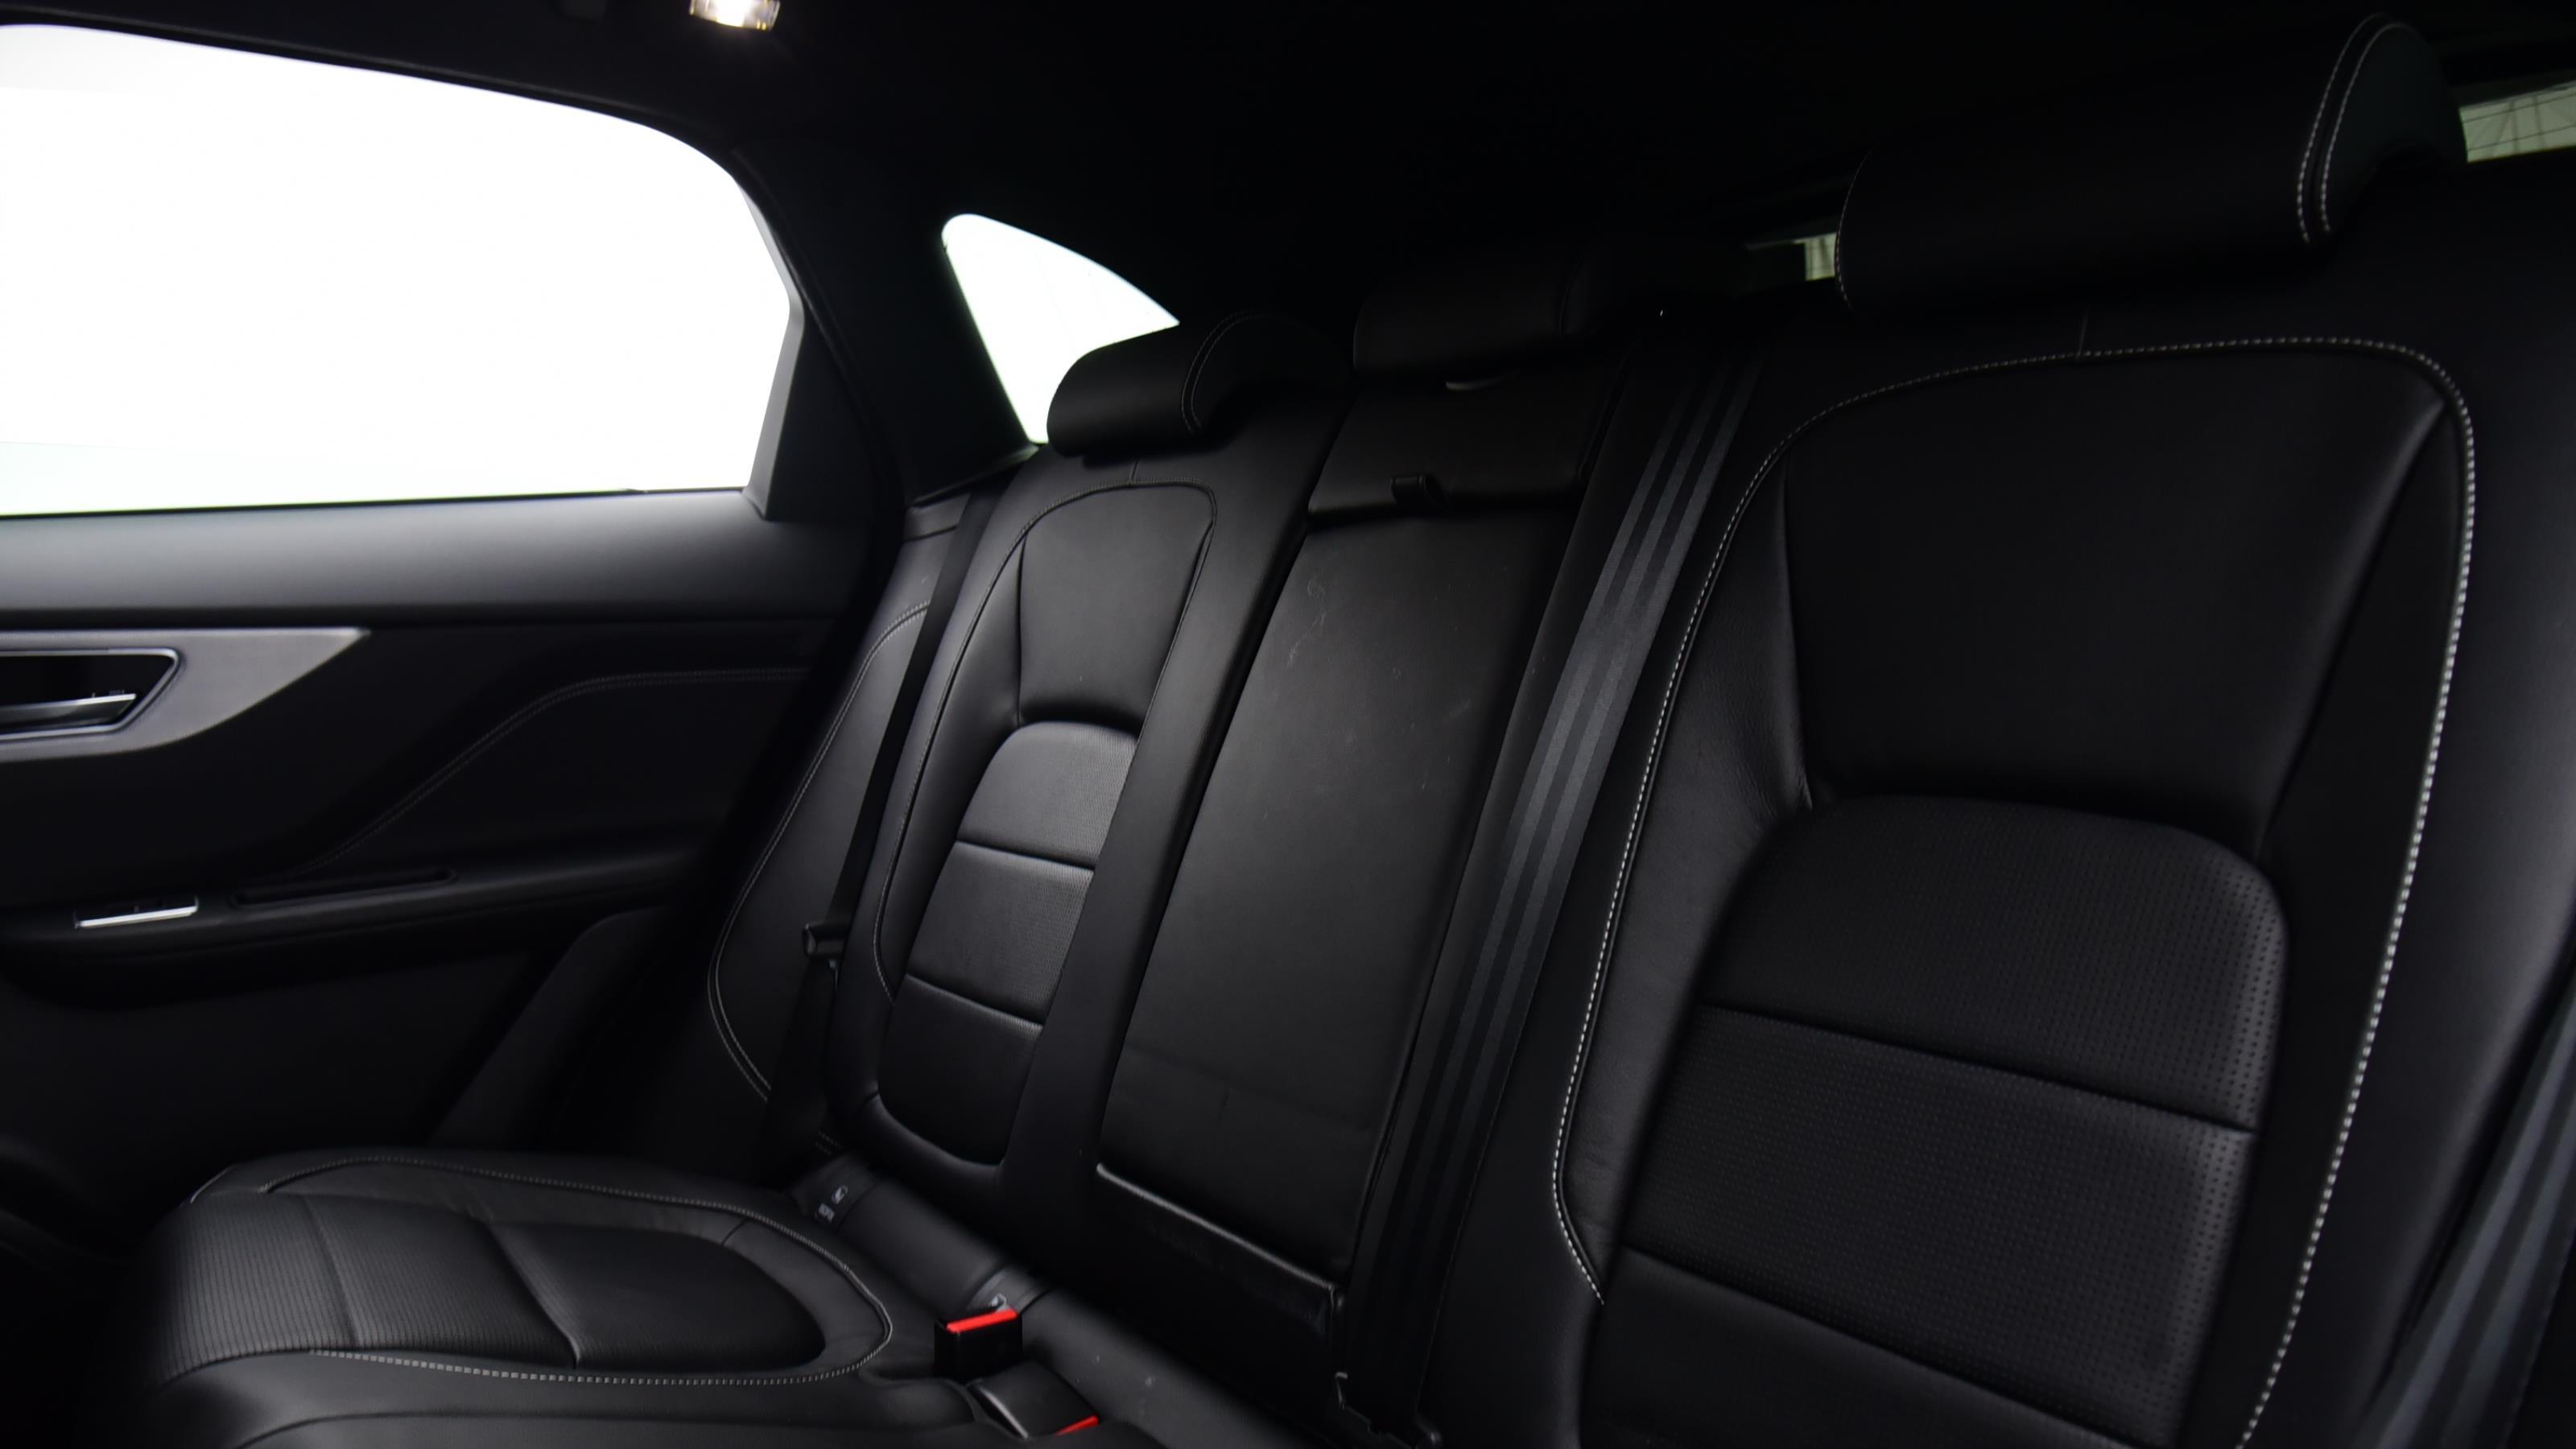 Used 2019 Jaguar F-PACE 2.0d R-Sport 5dr Auto AWD          at Saxton4x4